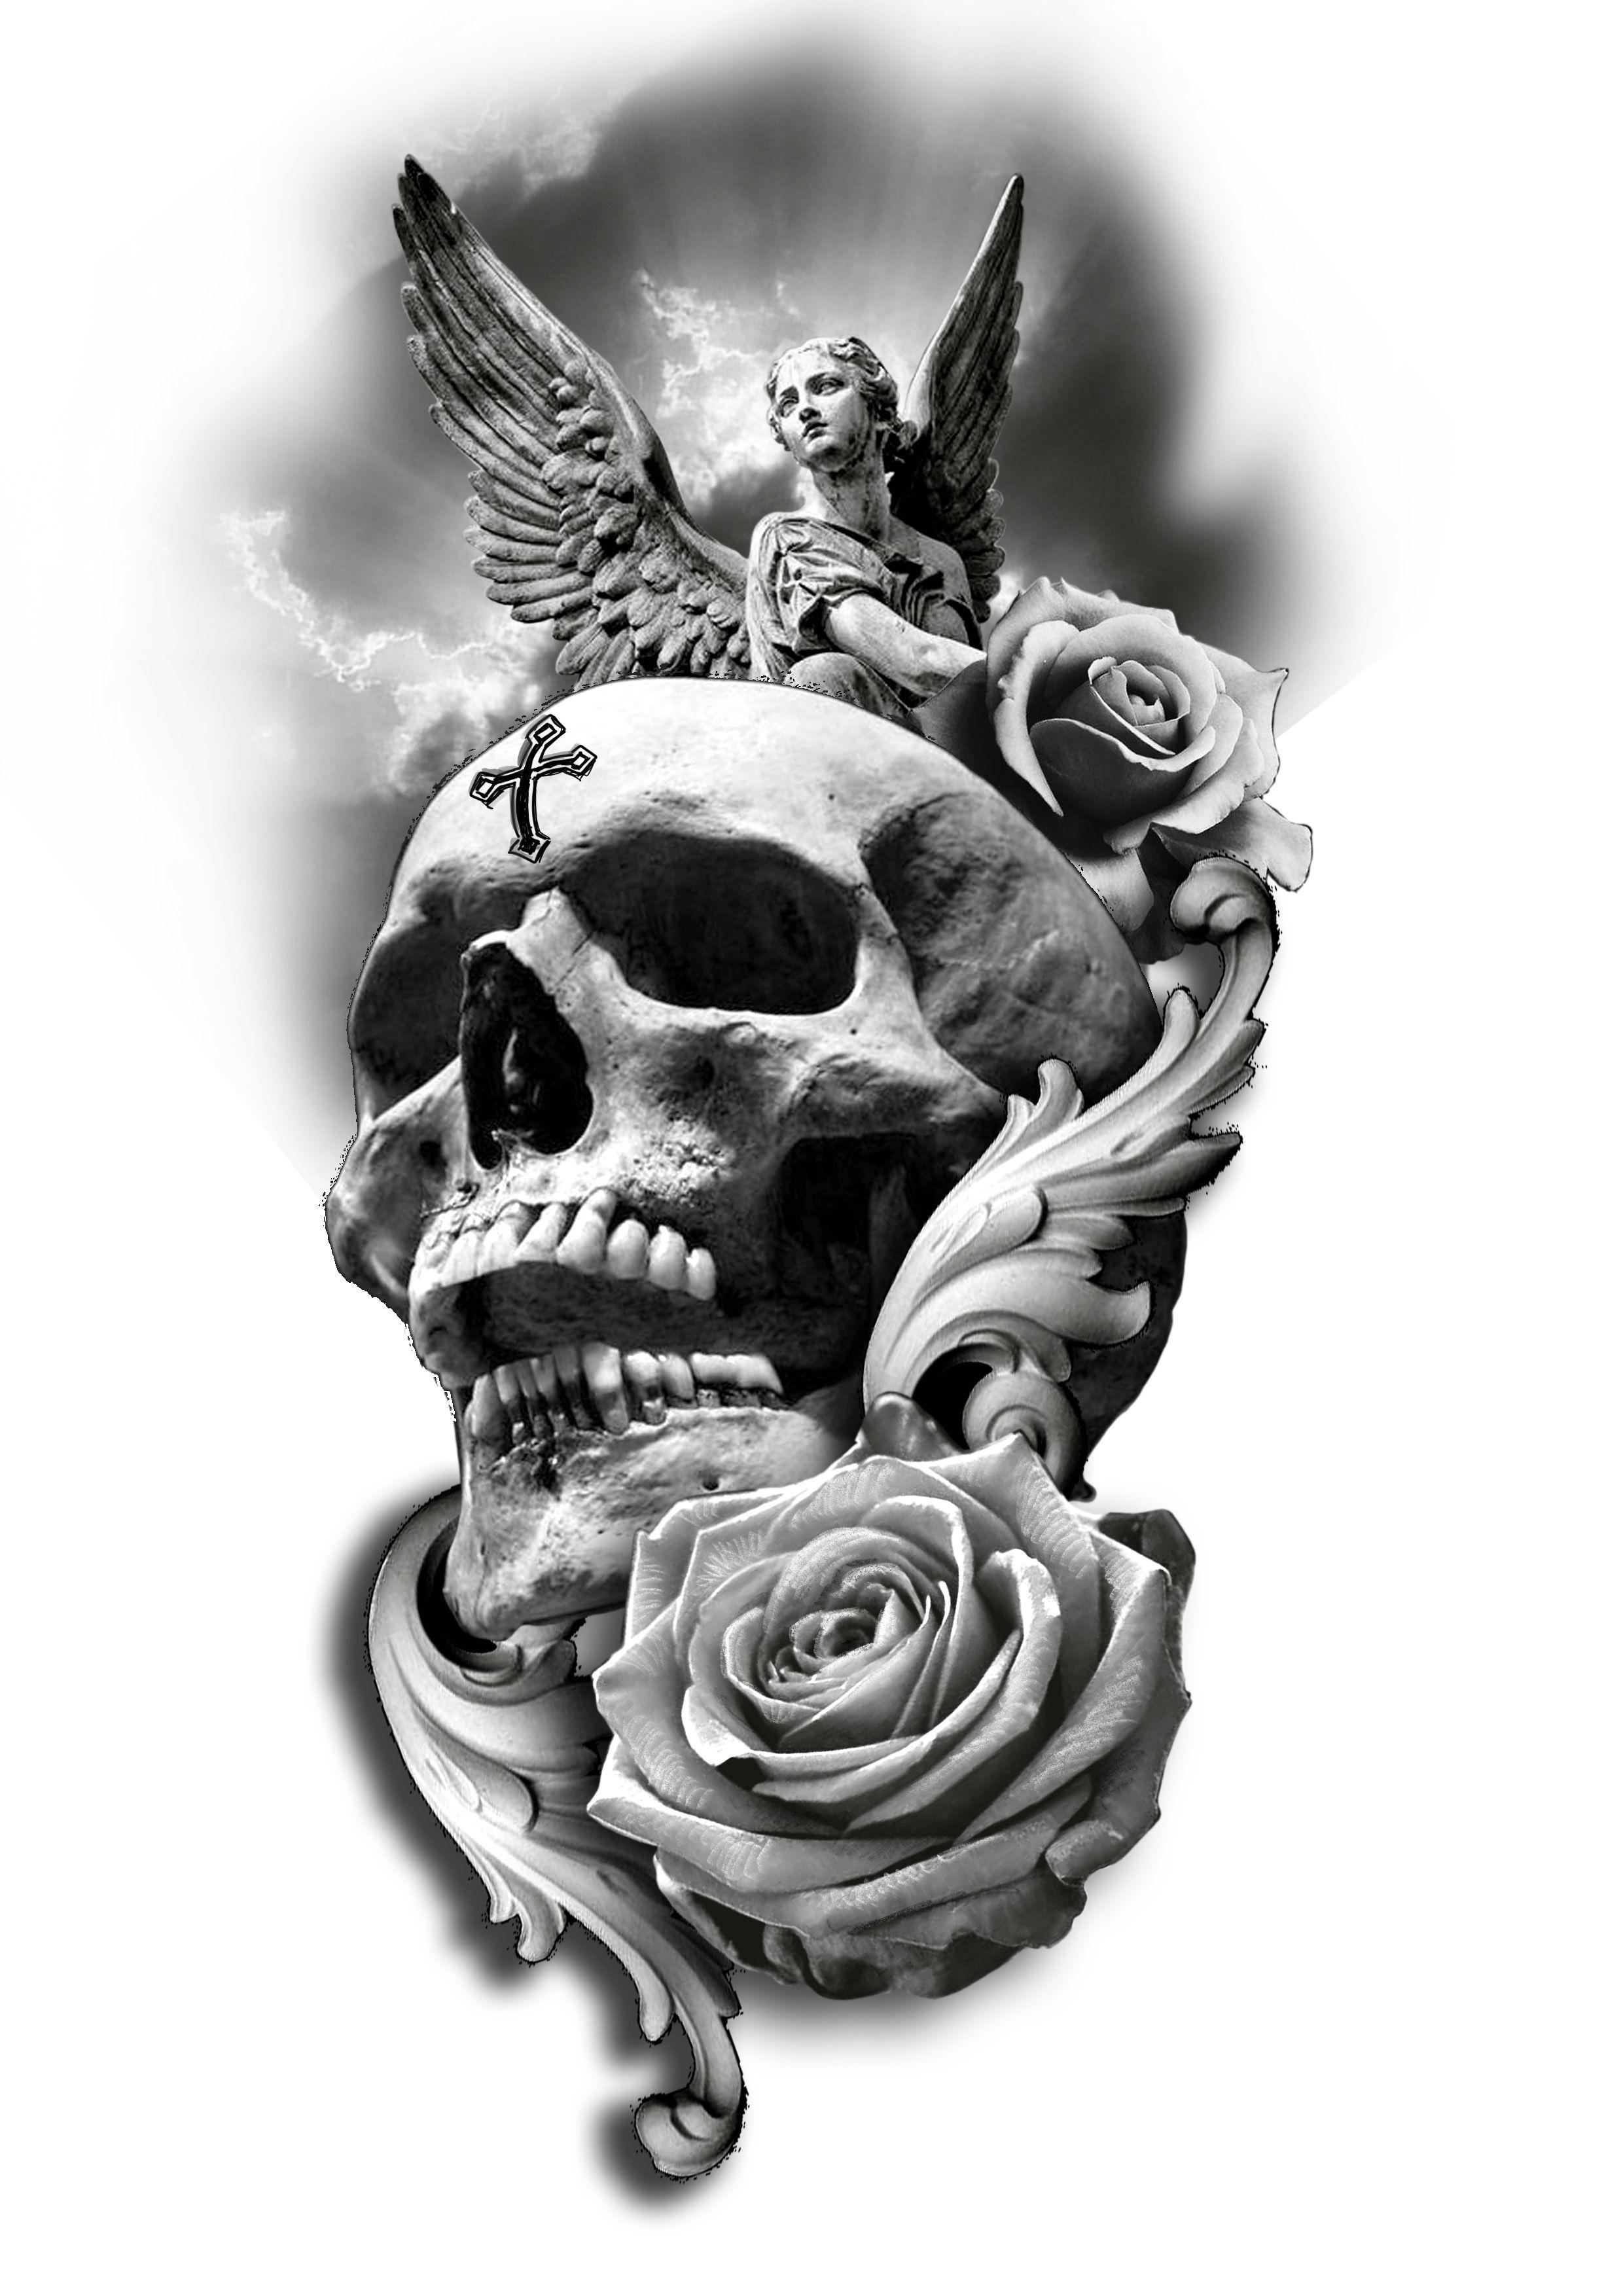 Skull Rose Angel Tattoo Design Skull Sleeve Tattoos Skull Rose Tattoos Angel Tattoo Designs